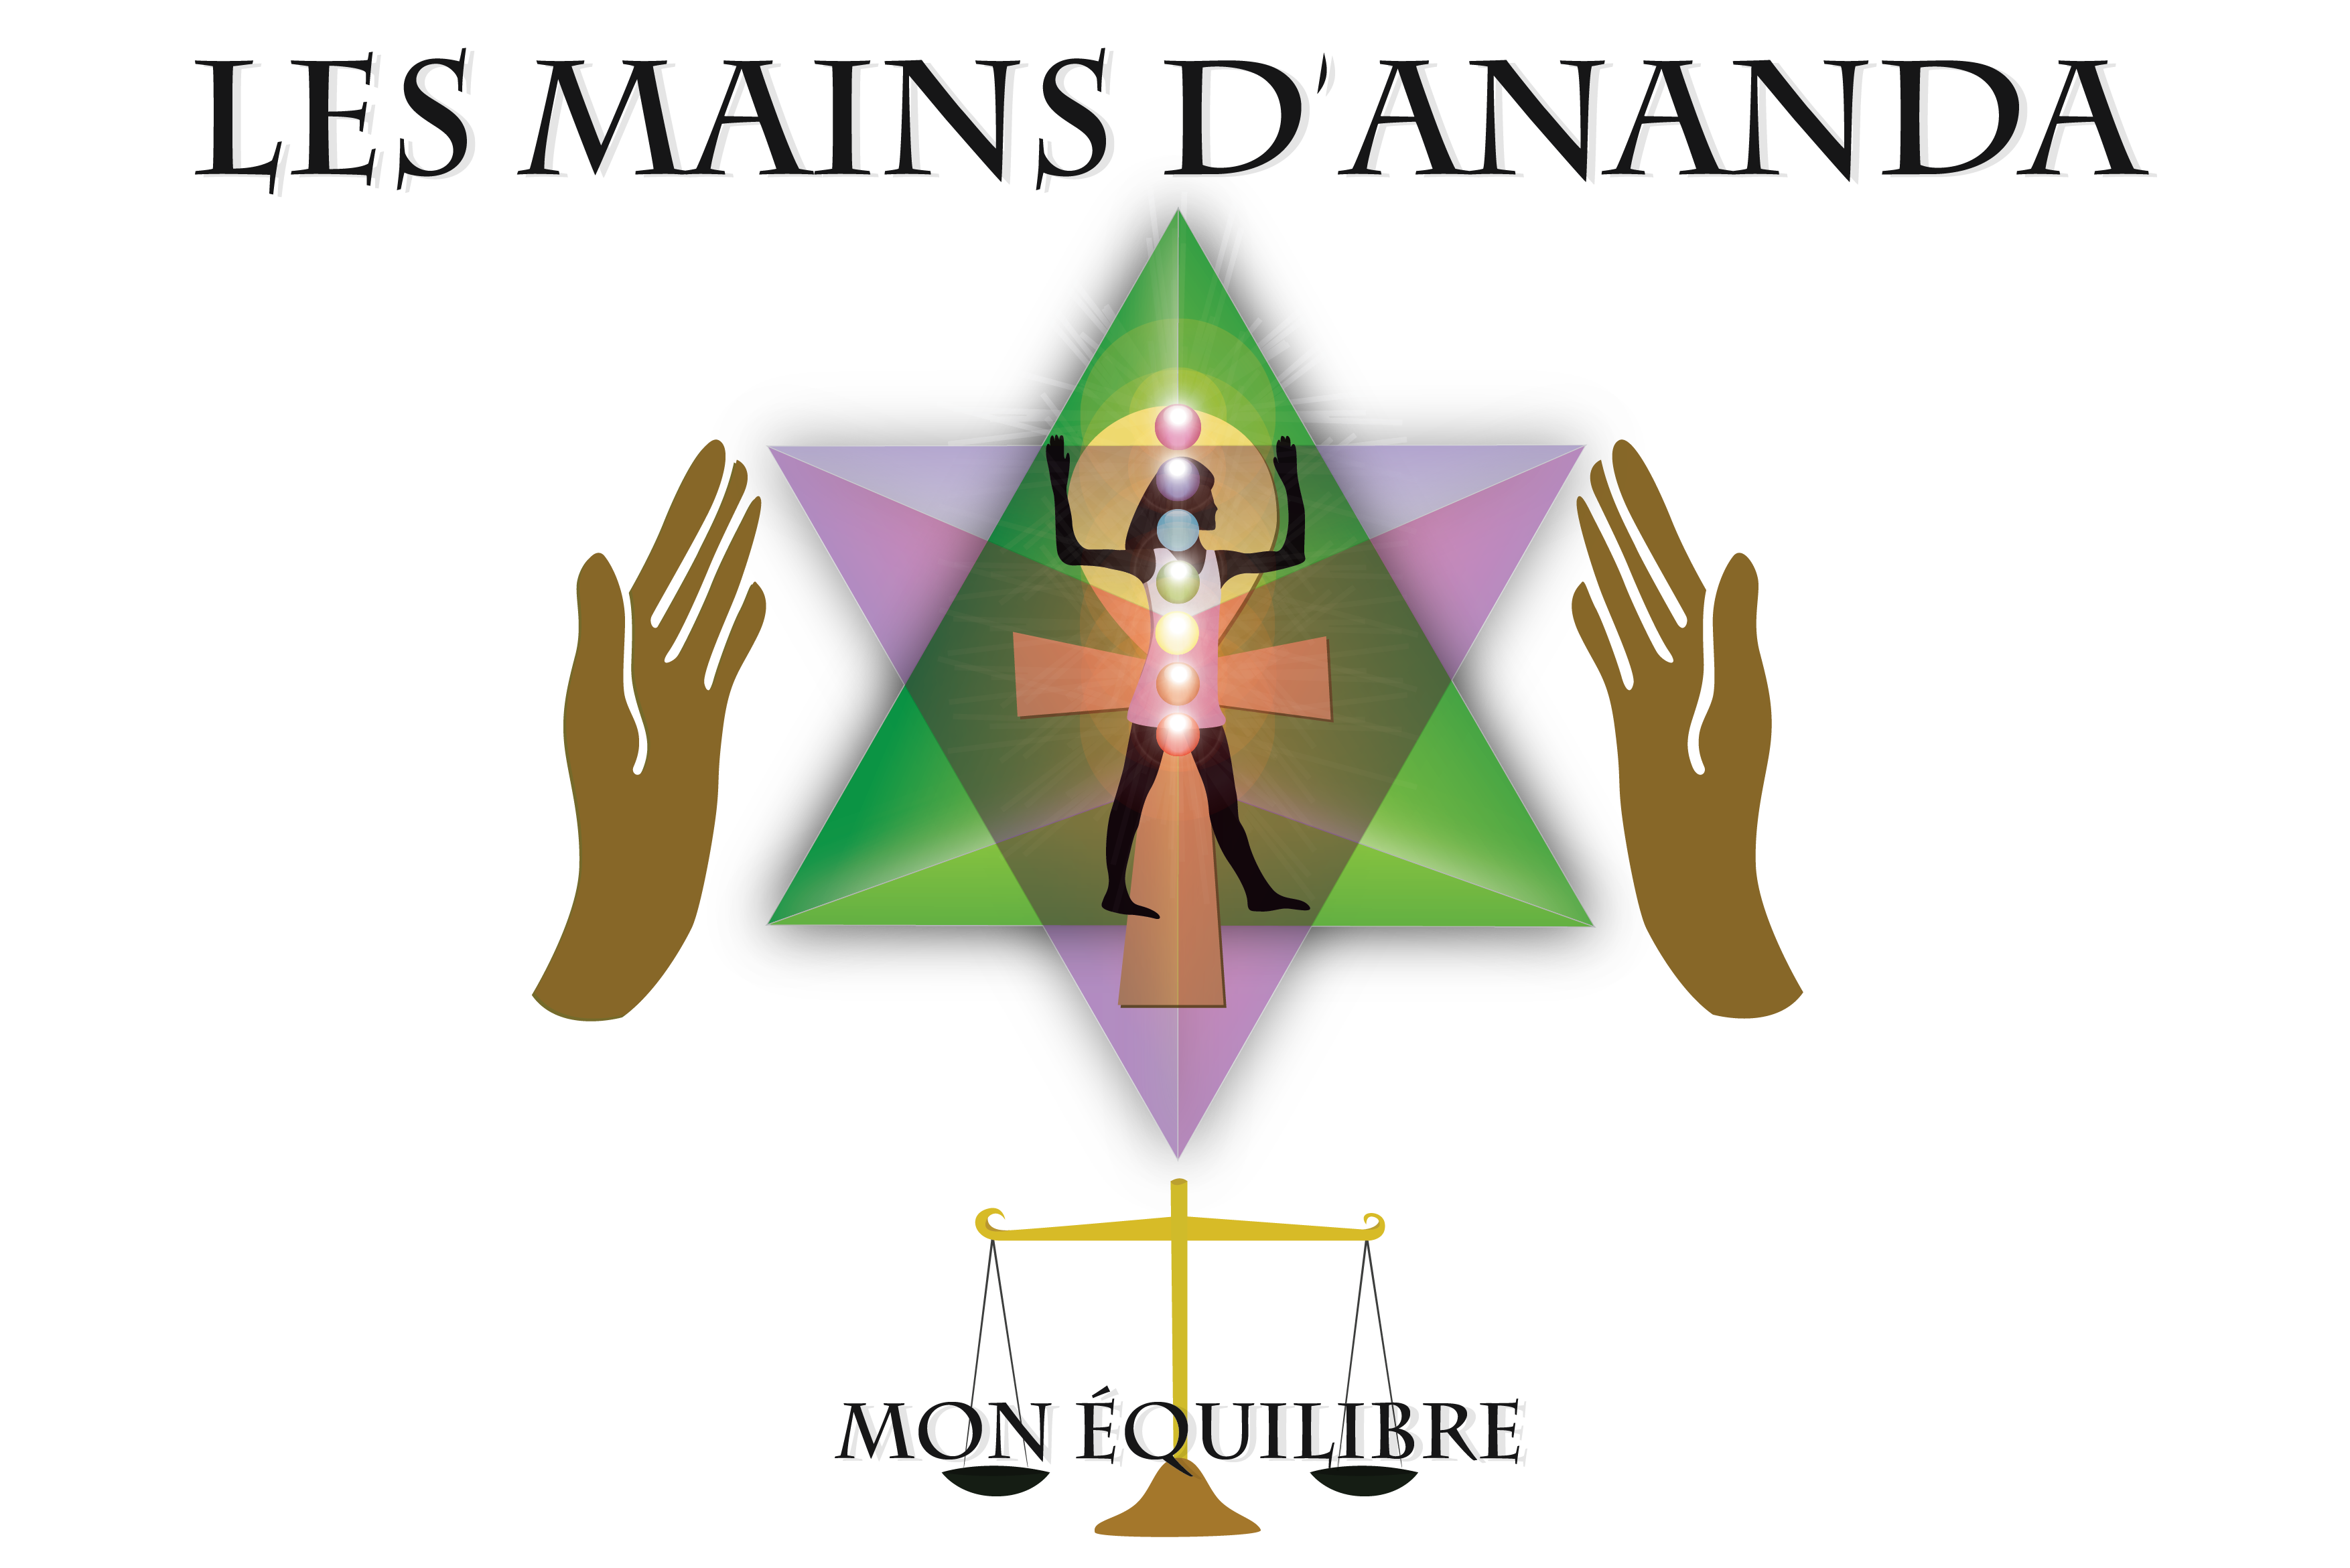 Les Mains d'Ananda